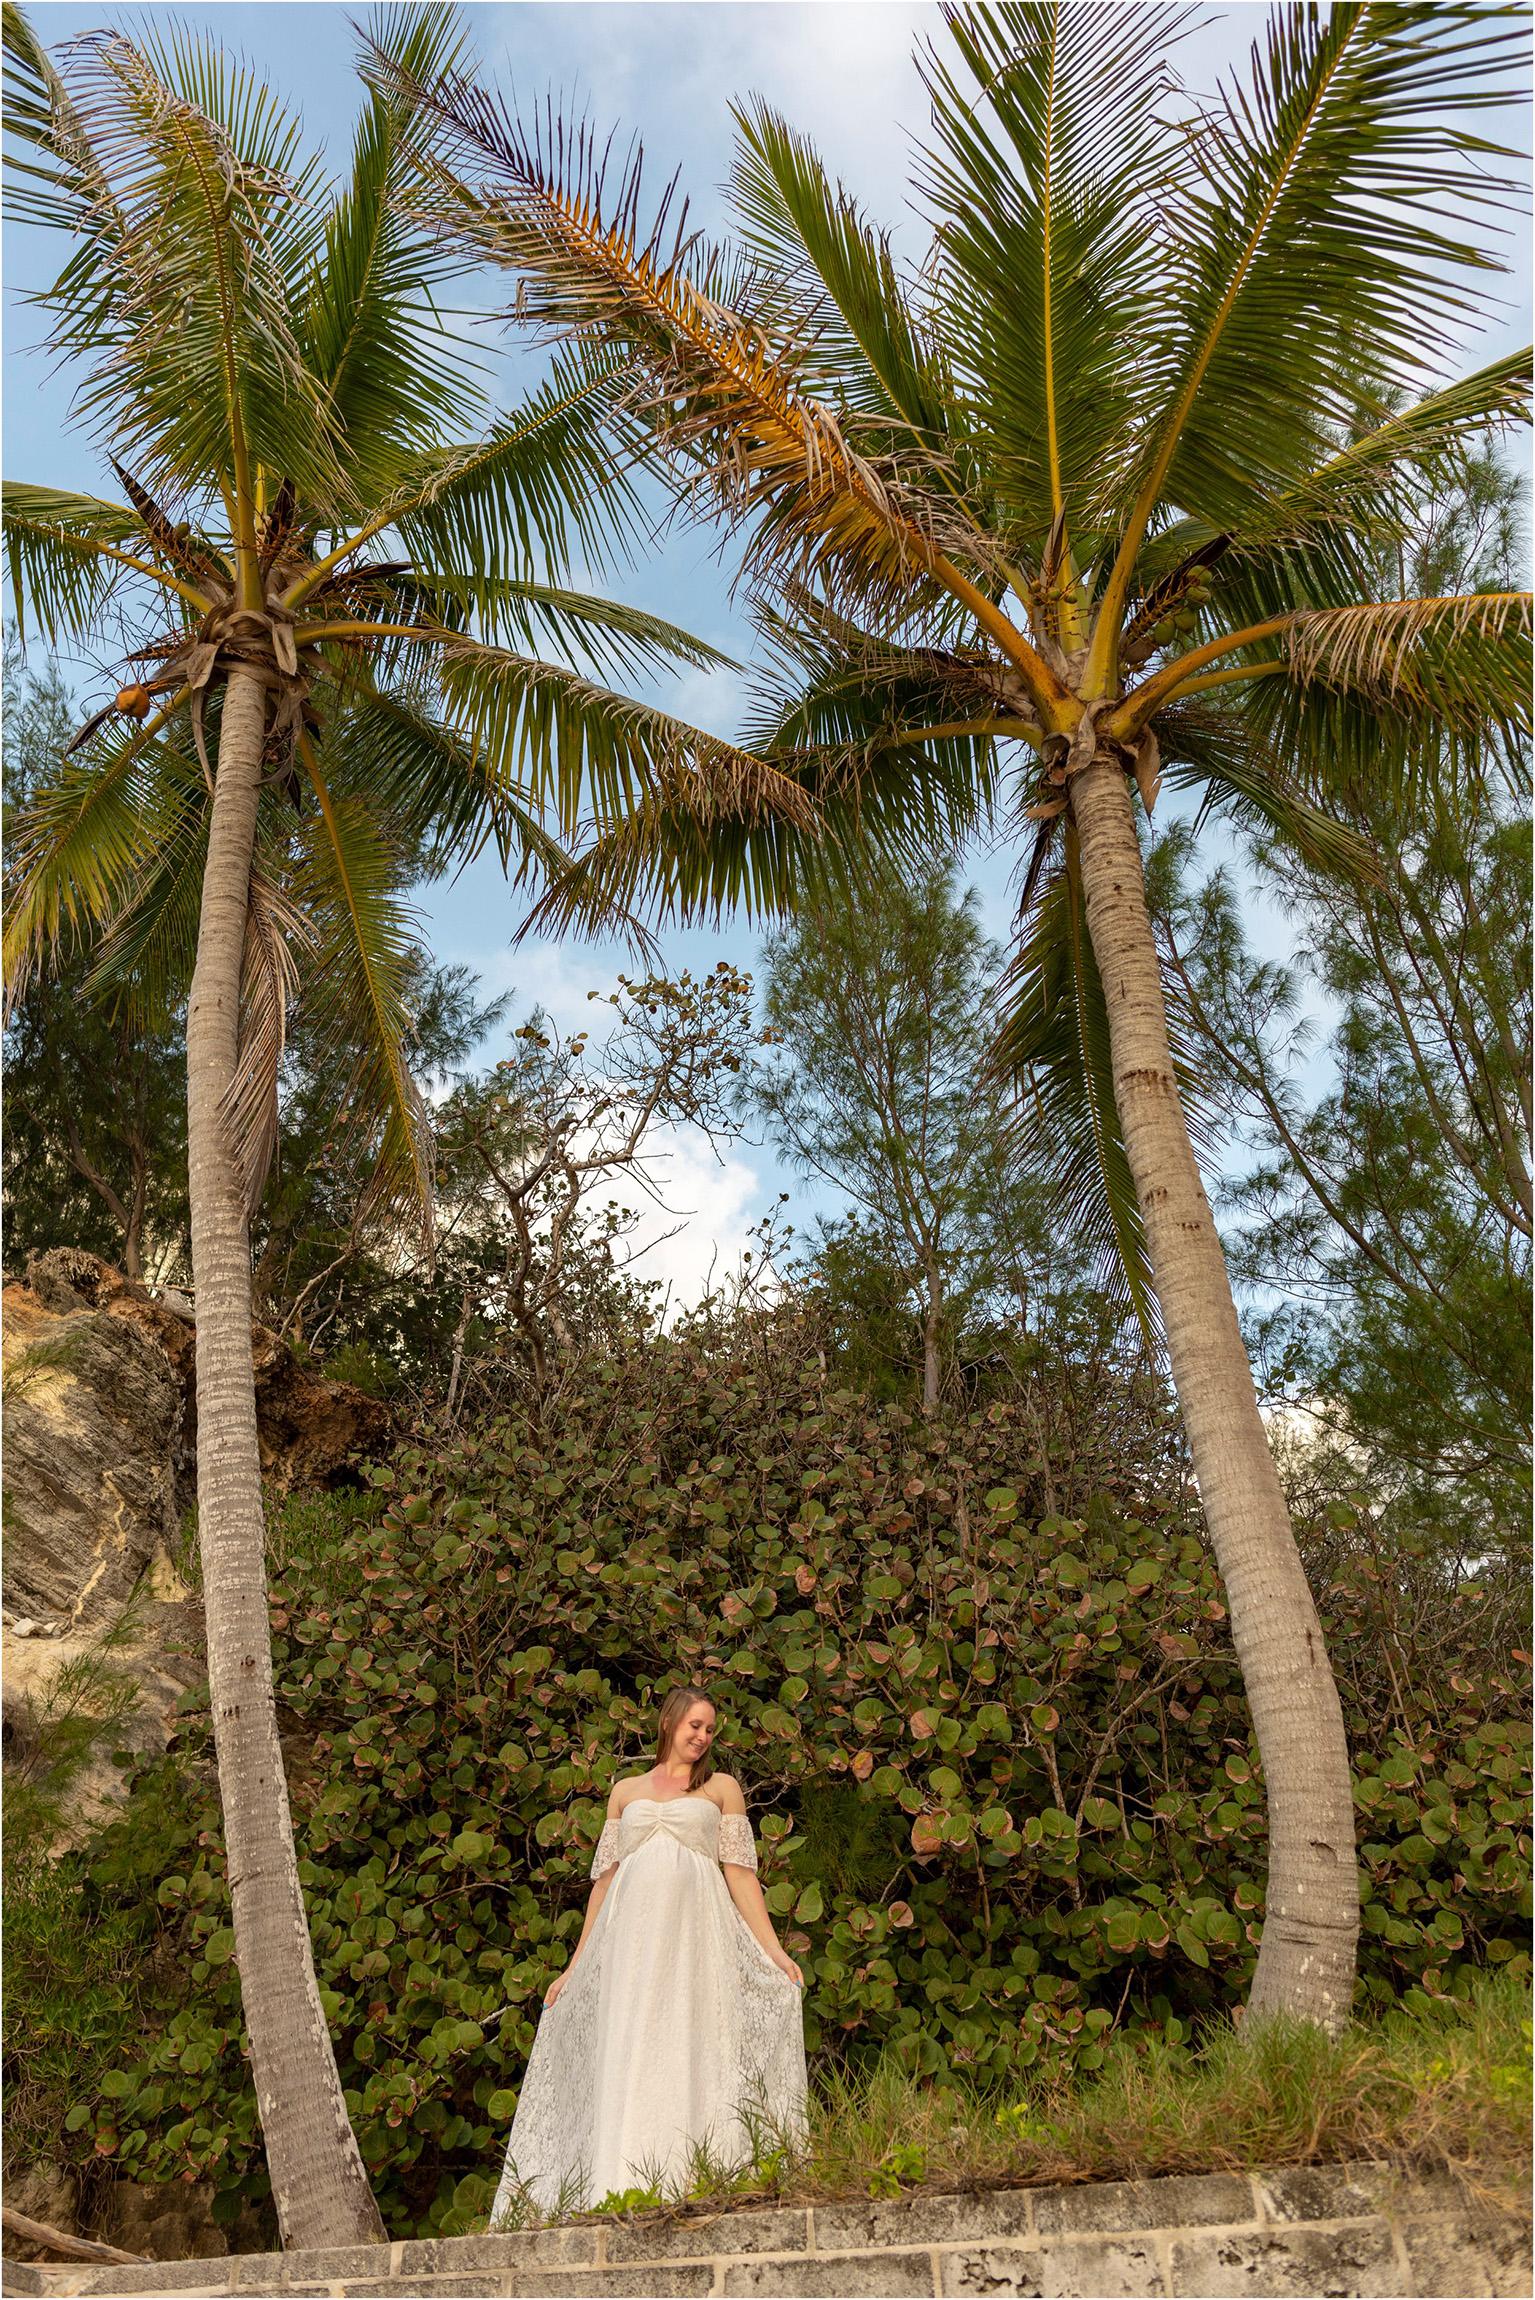 ©FianderFoto_Bermuda Maternity Photographer_Betsy_002.jpg